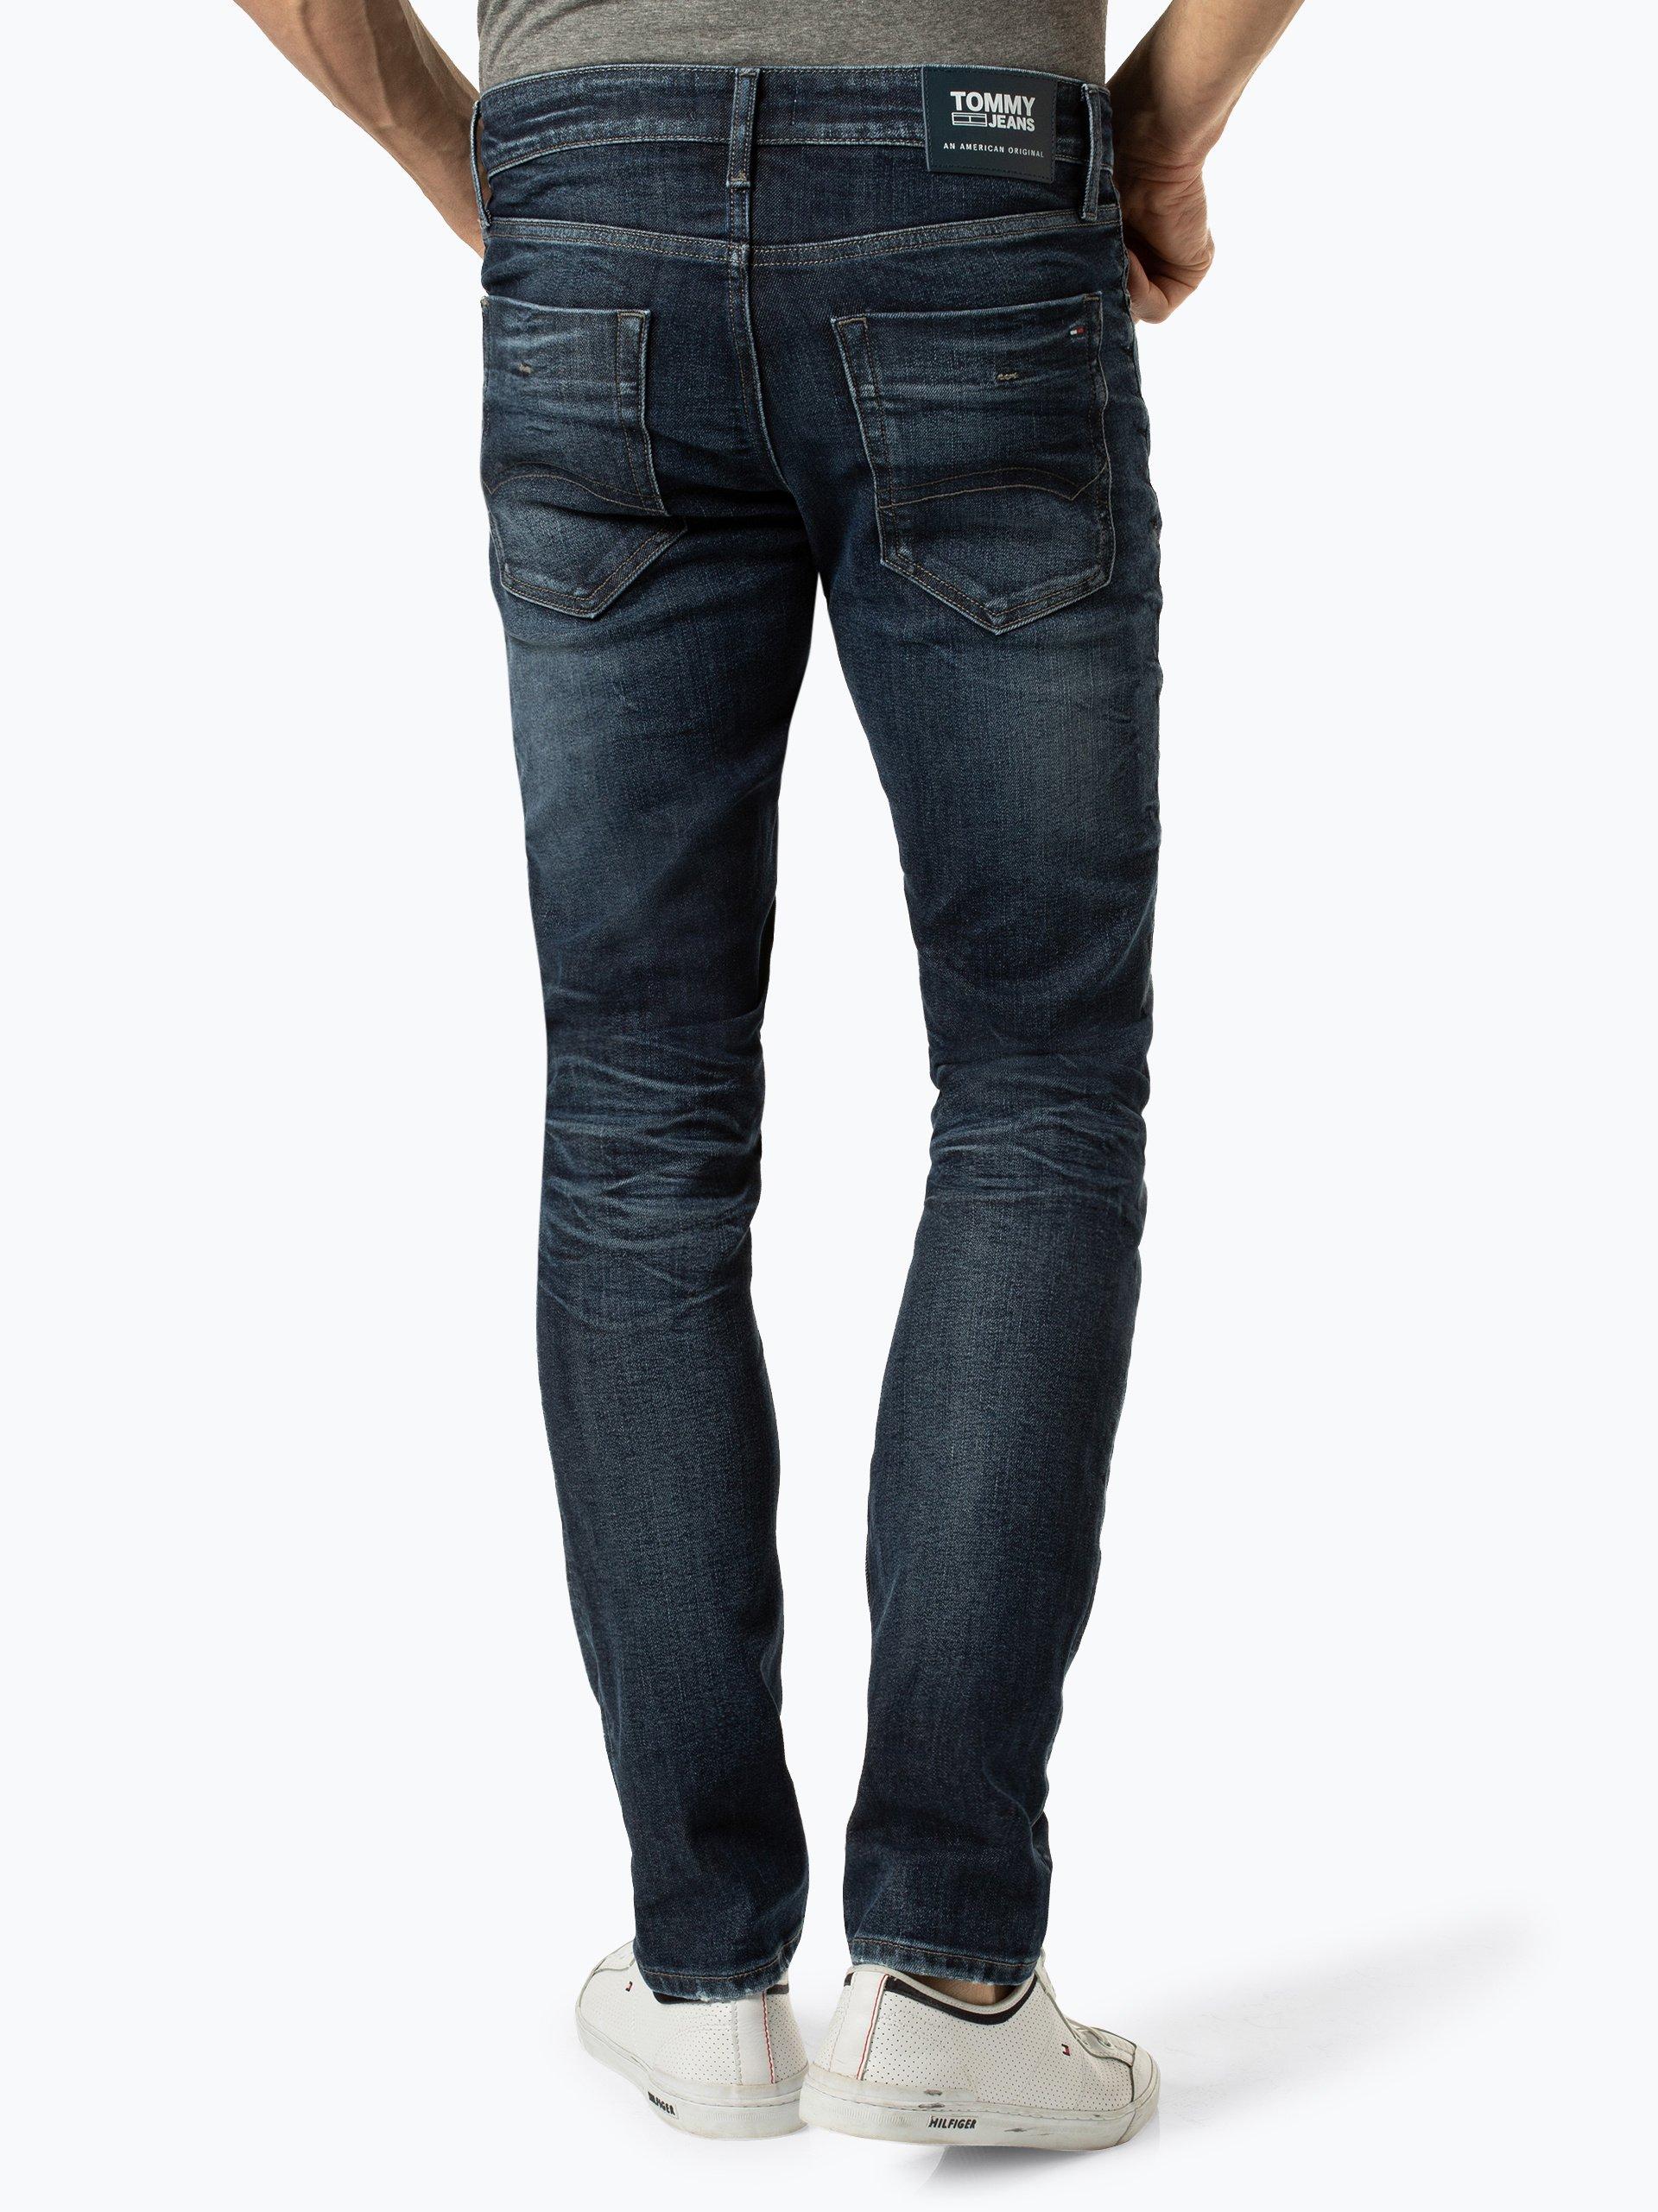 Tommy Jeans Jeansy męskie – Scanton